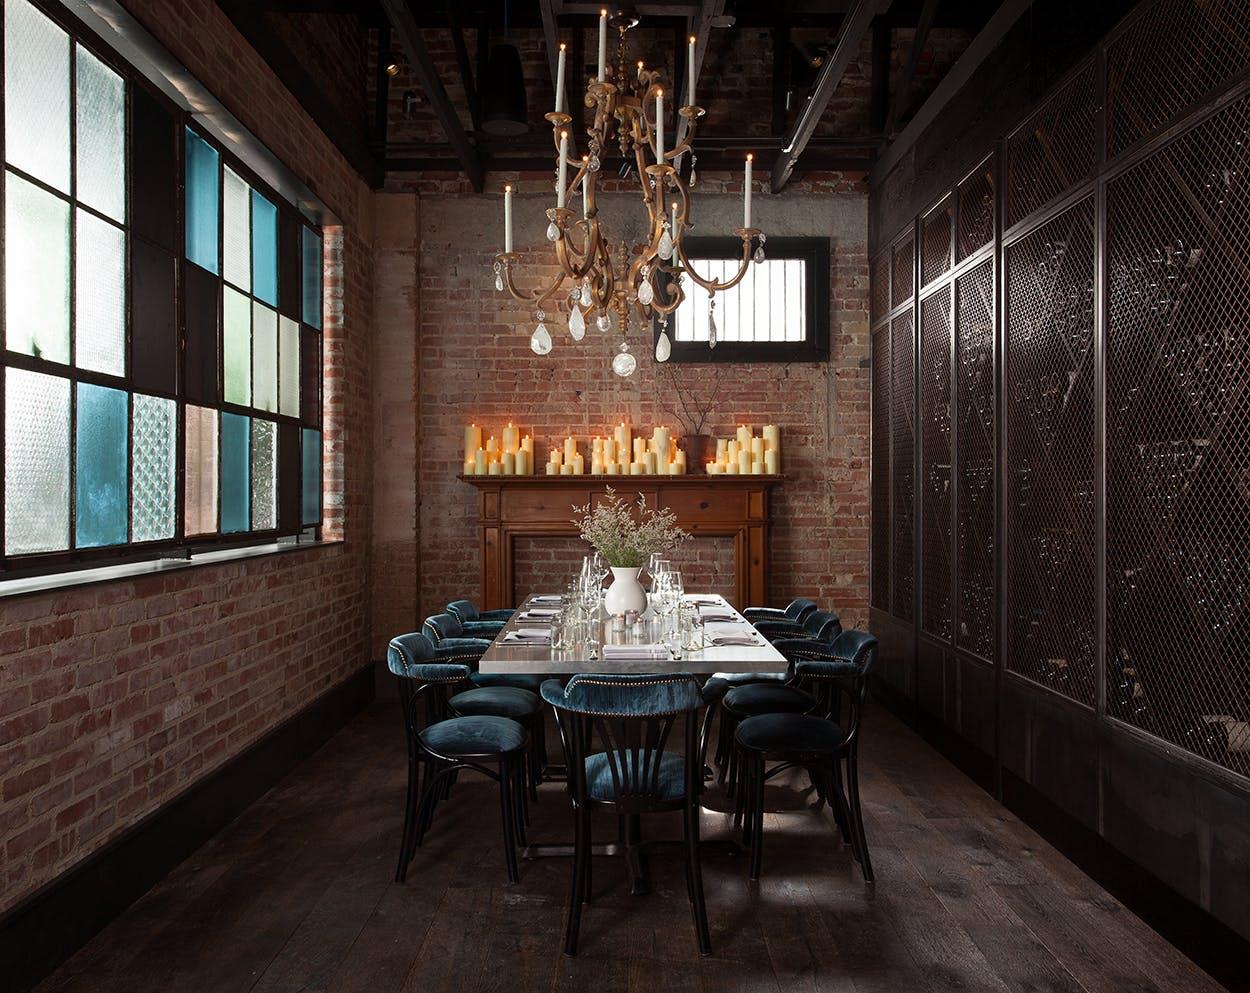 Restaurant design The wine room at Maverick Texas Brasserie in San Antonio.